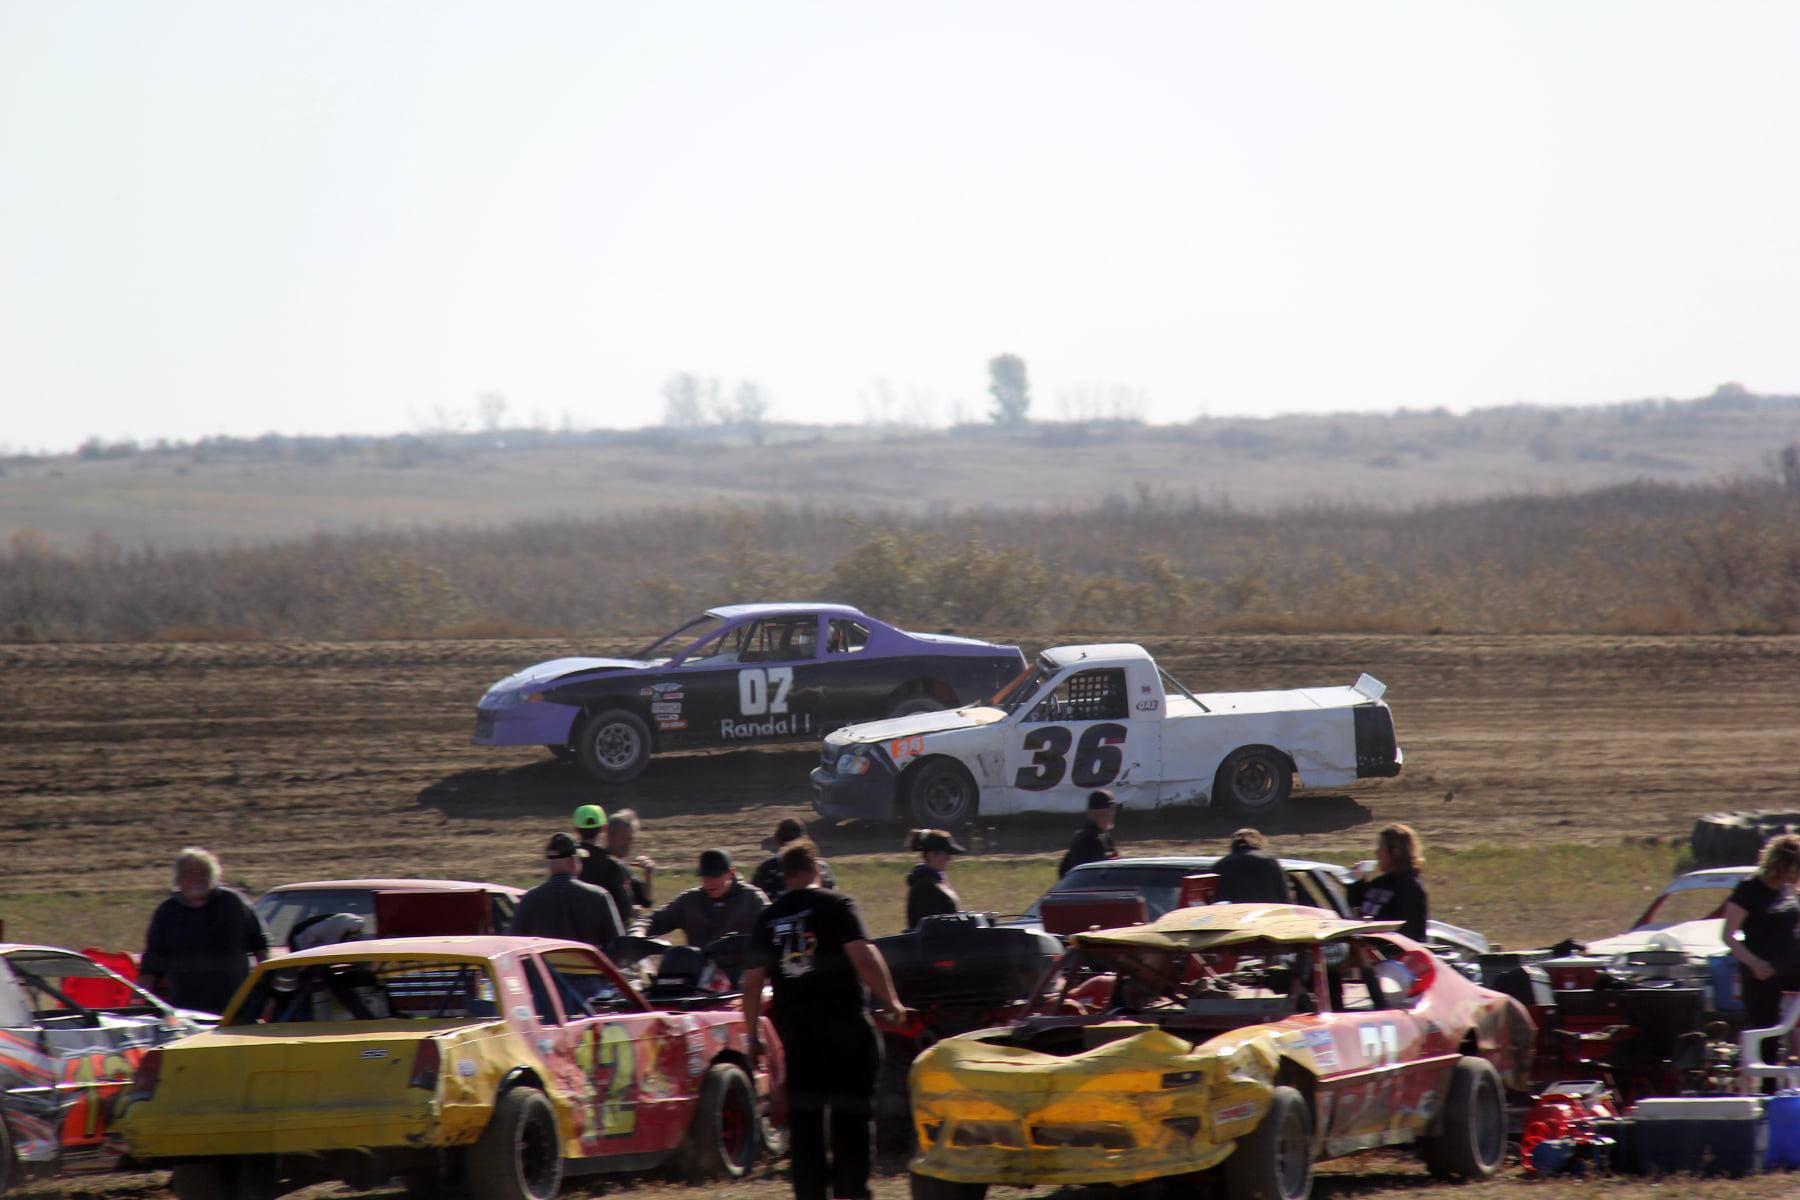 Outlook_Racing_Kemmer_Racing_Photography_4.jpg